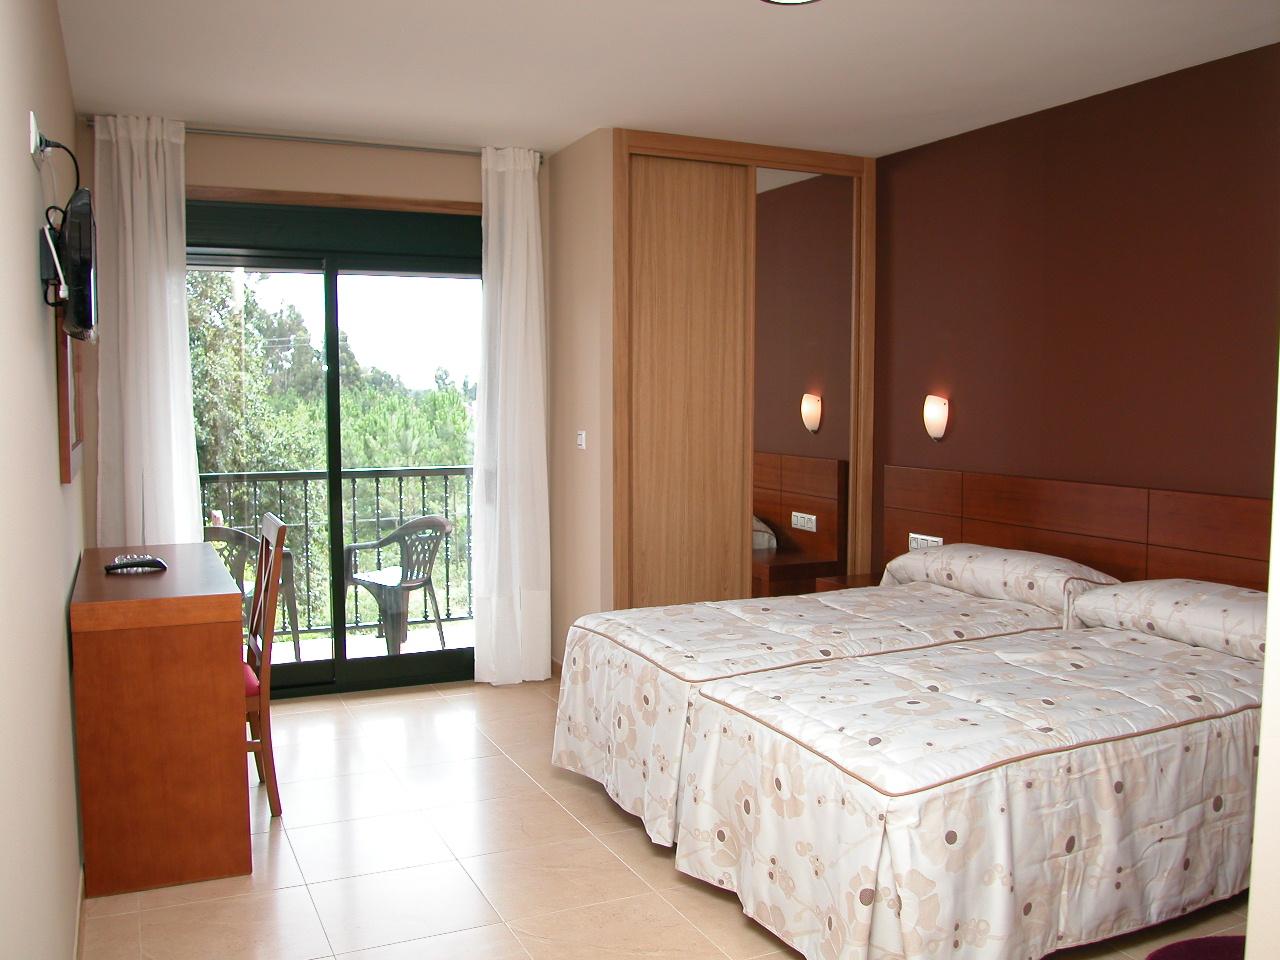 hotel-cachada 5069